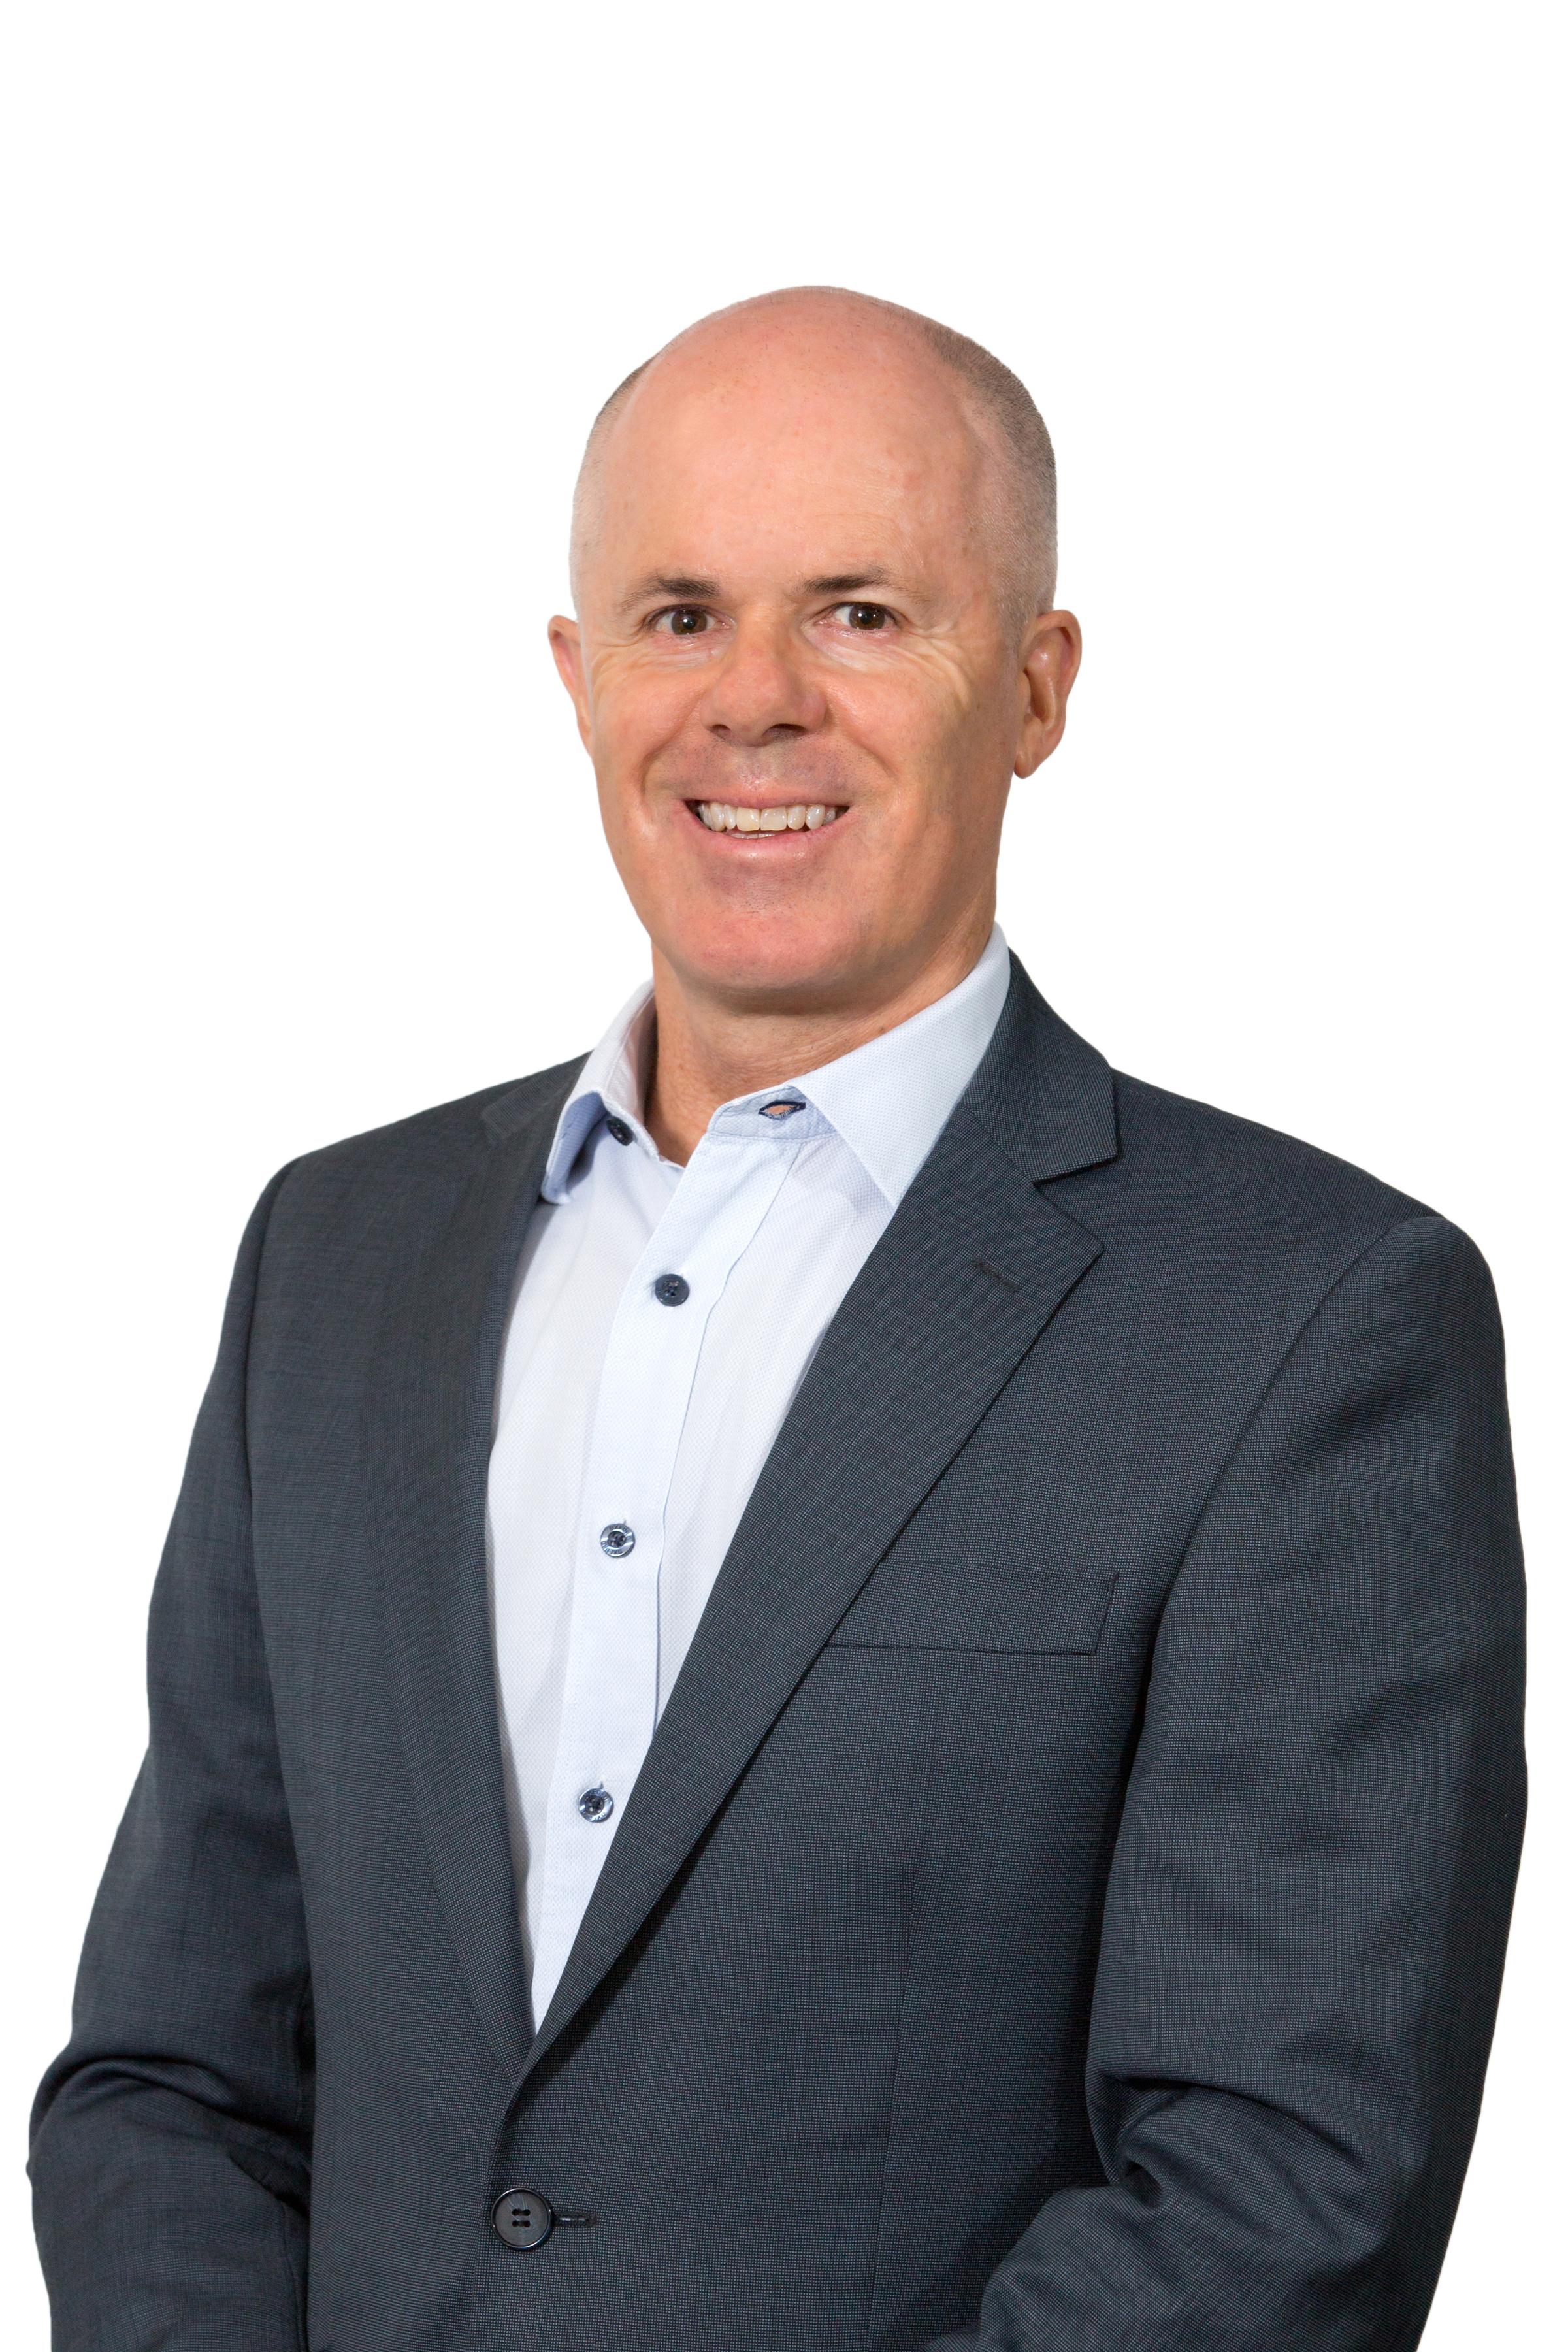 Grant McEnally